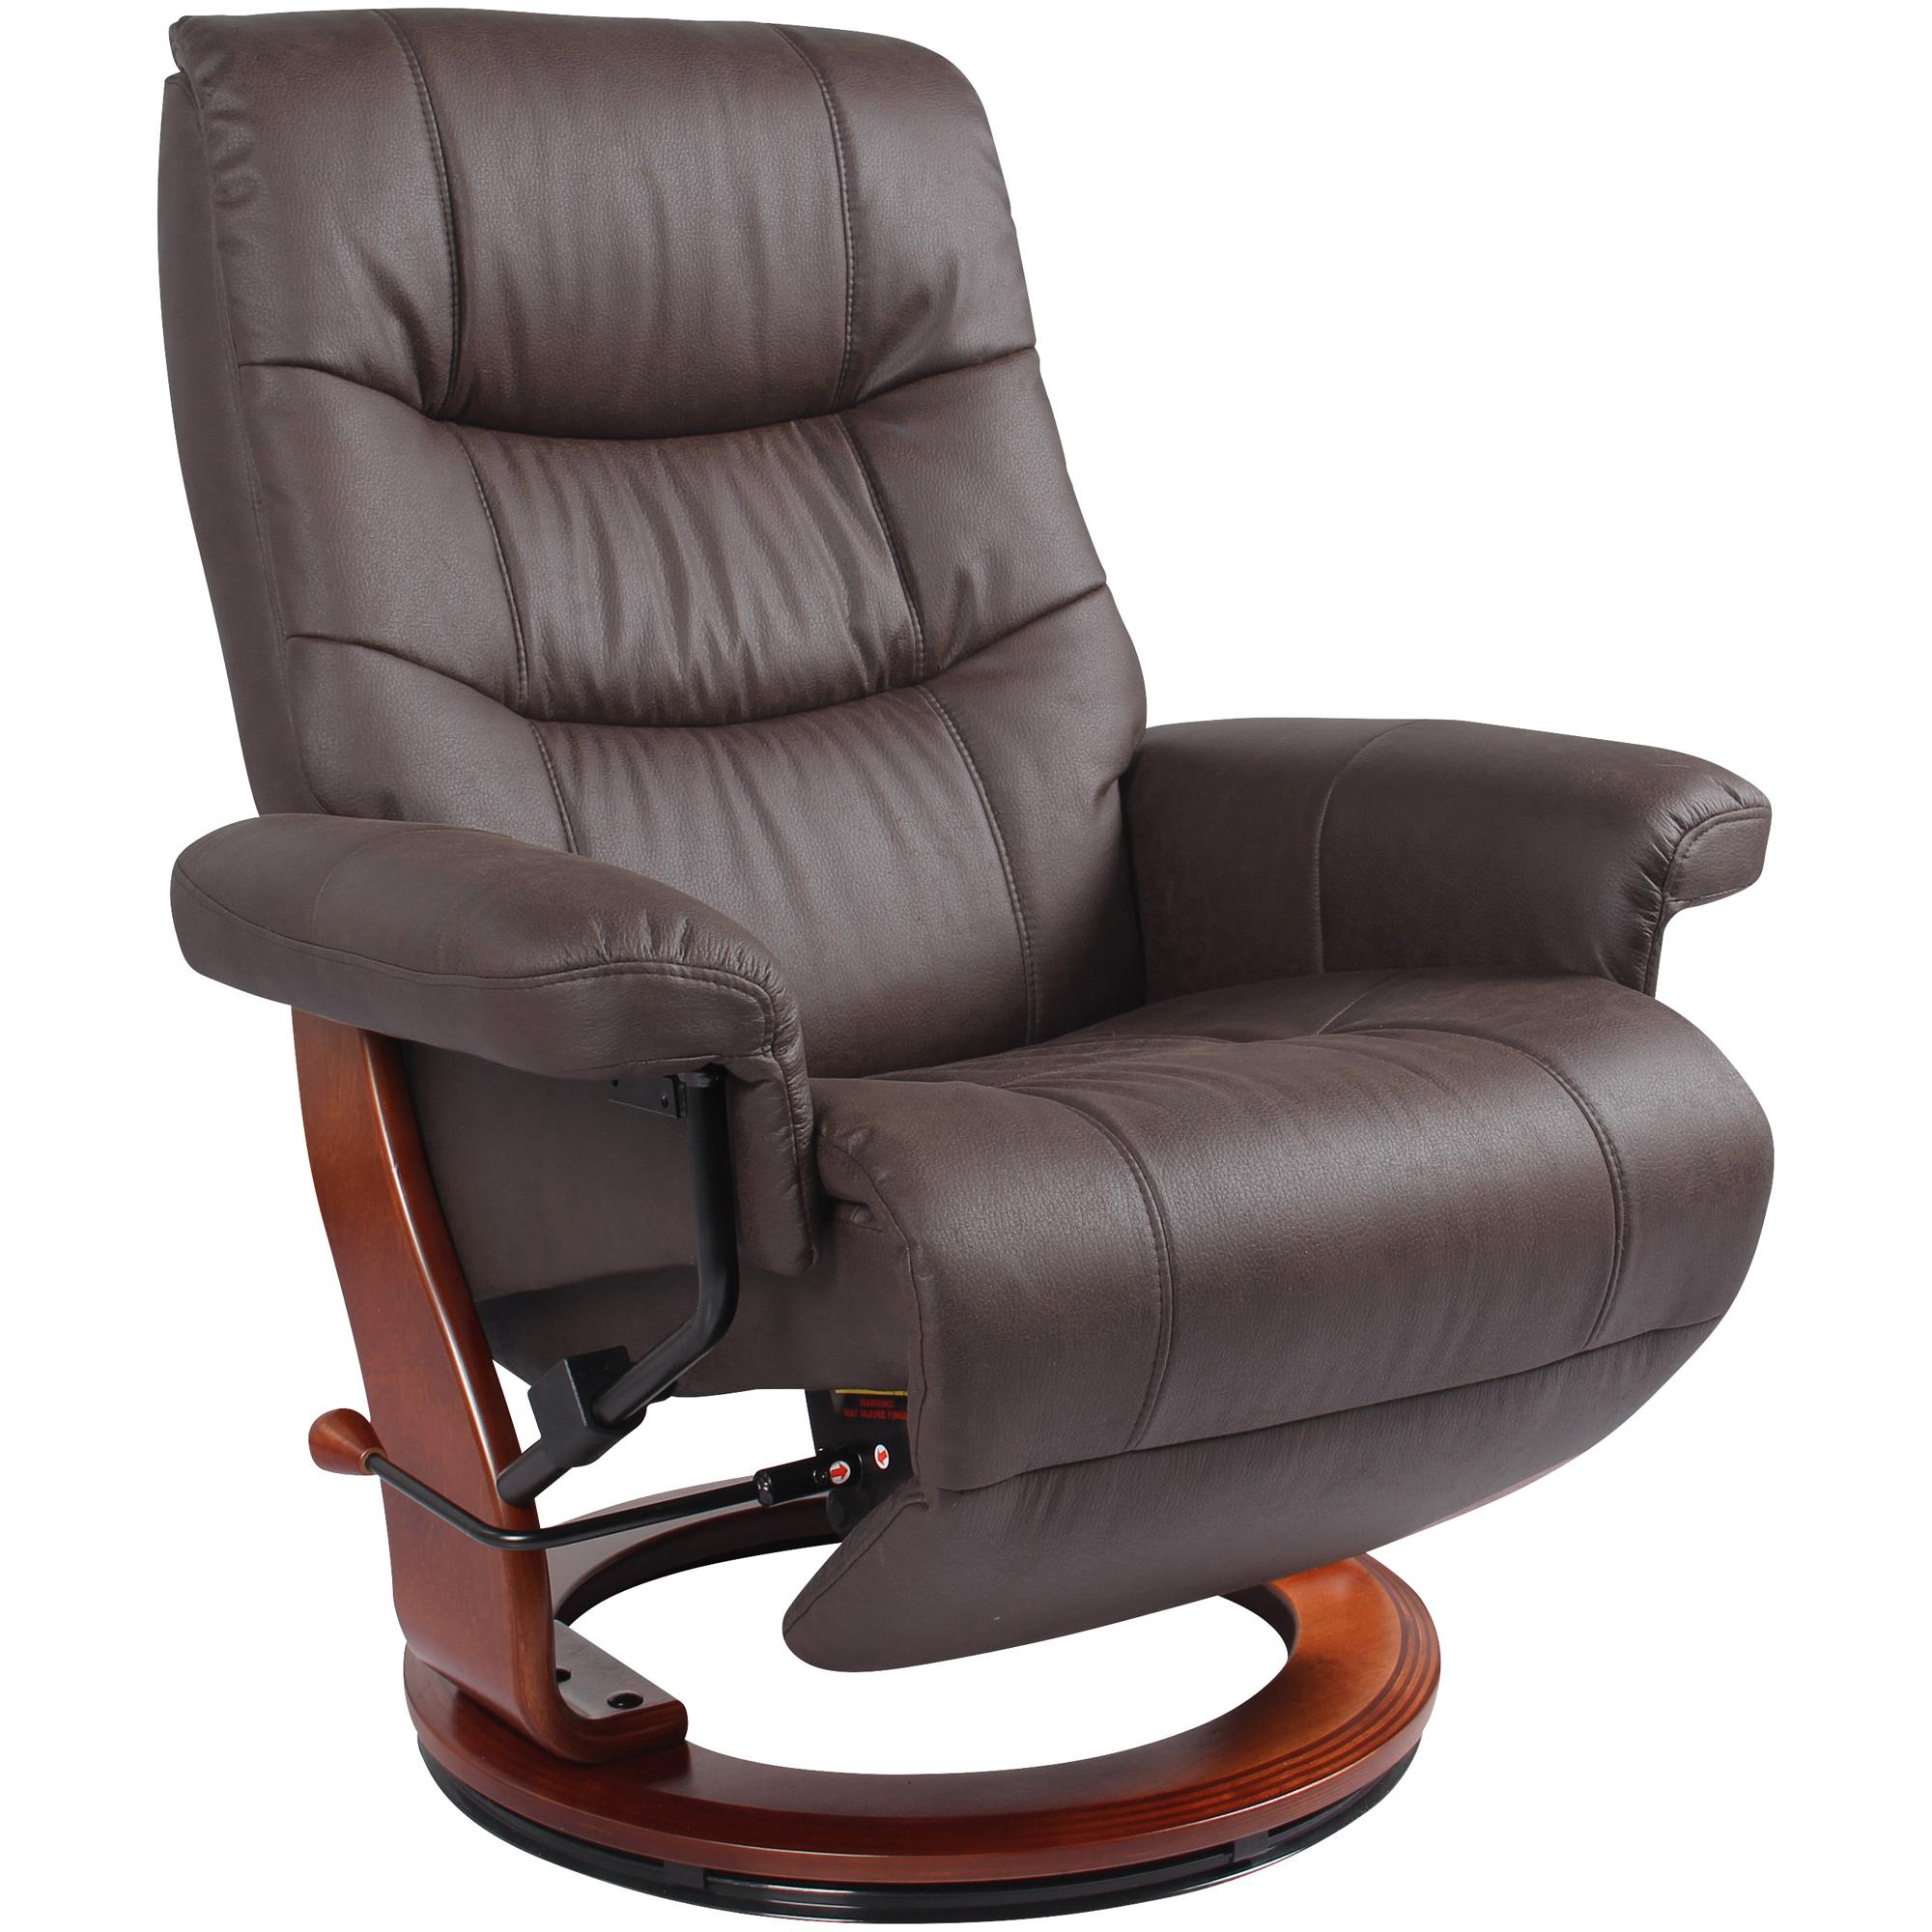 Benchmaster | Valencia Dark Brown Recliner Chair with Flip Up Footrest